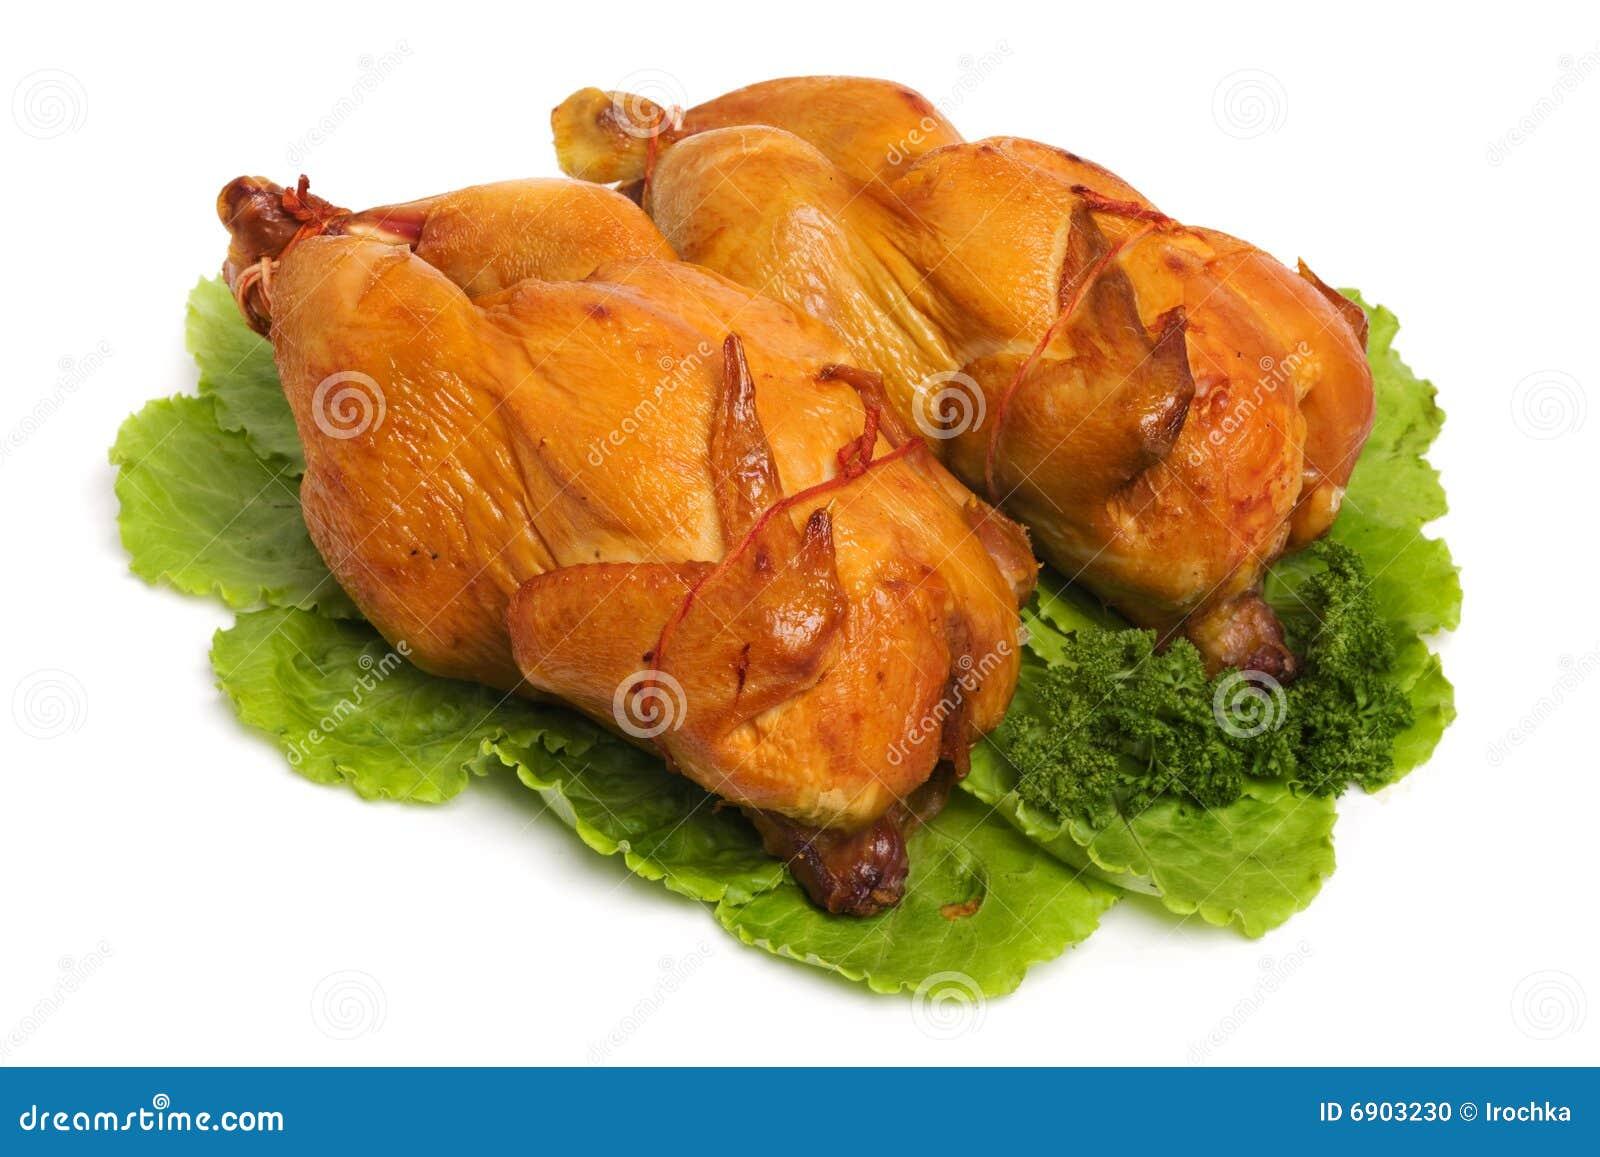 Roast Chicken Stock Photo - Image: 6903230